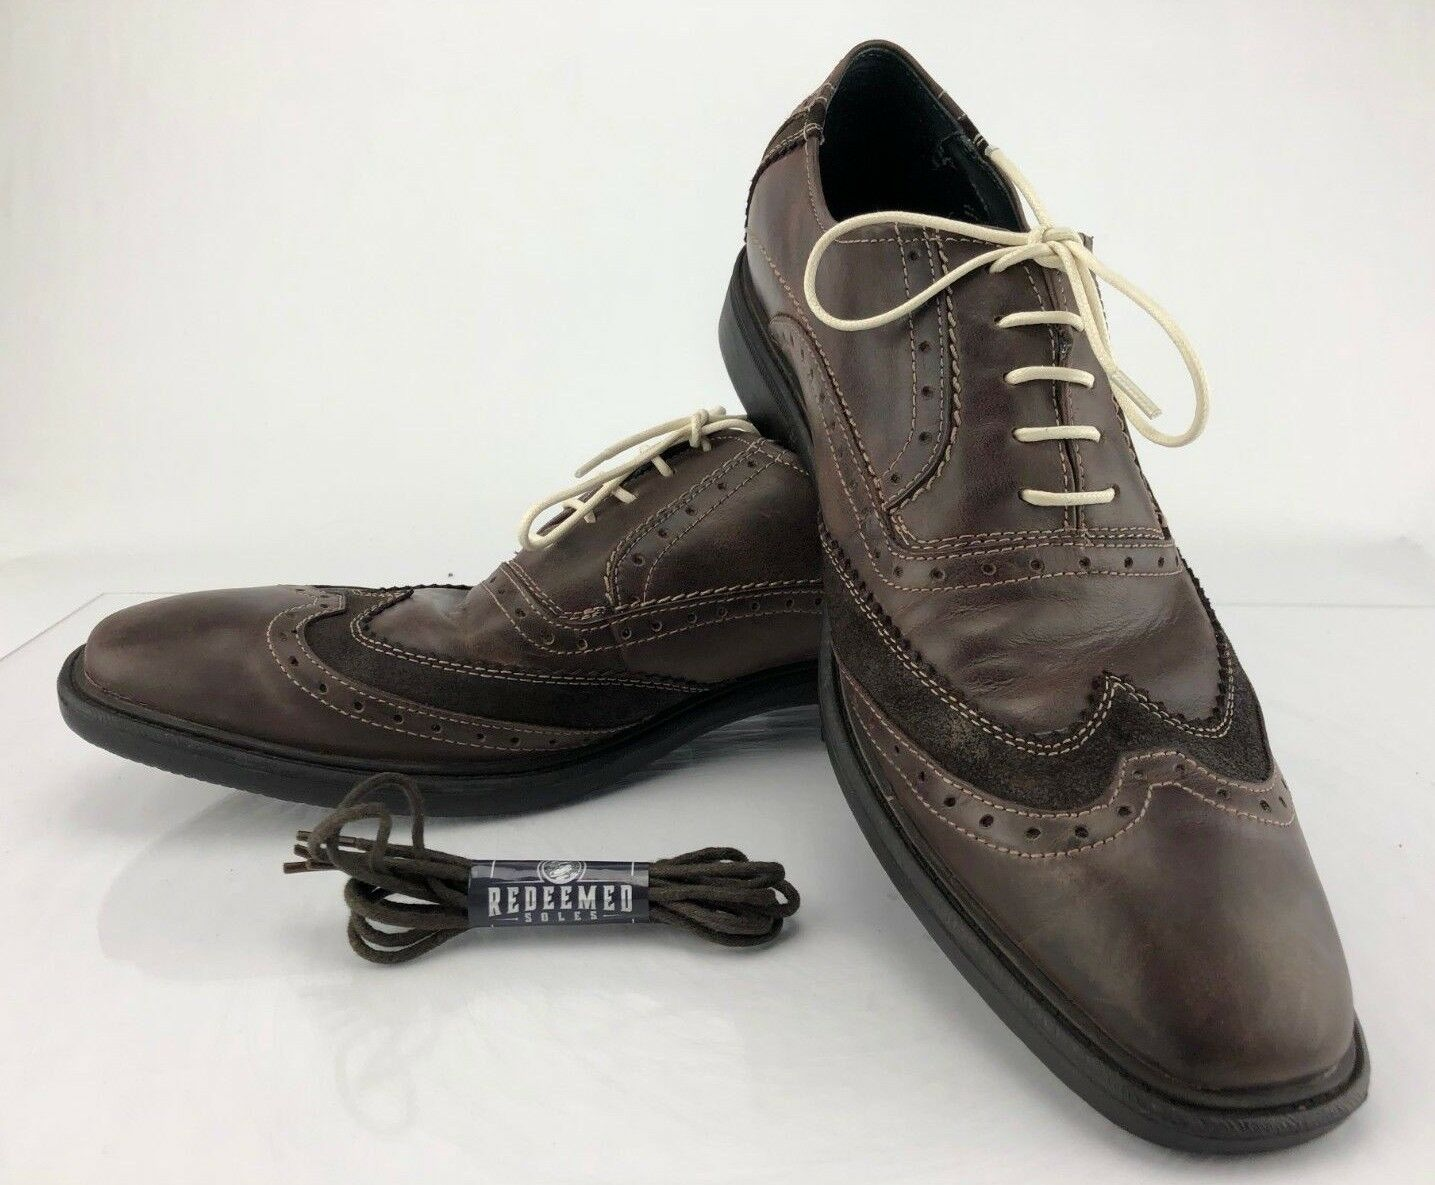 John Lennon Lucy Oxfords - Brown Leather Lace Up Brogue Casual shoes Men's Sz 13D